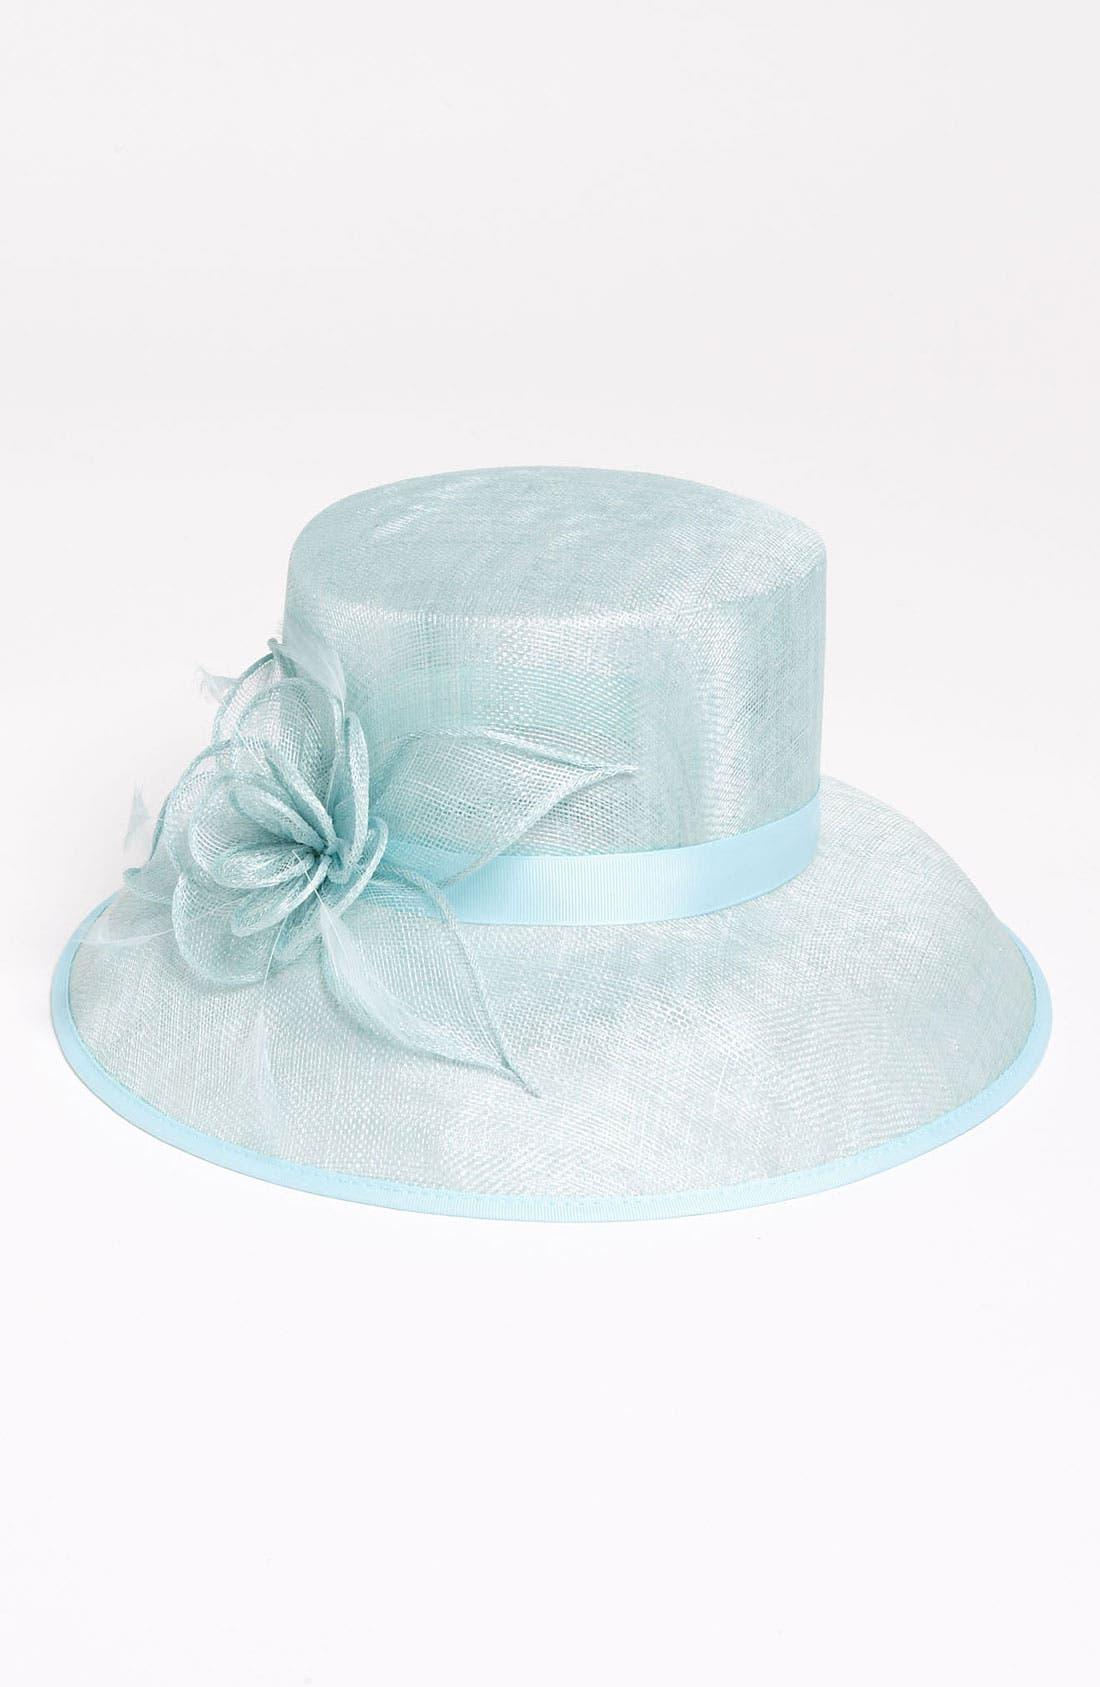 Alternate Image 1 Selected - Nordstrom 'Medium' Down Brim Derby Hat